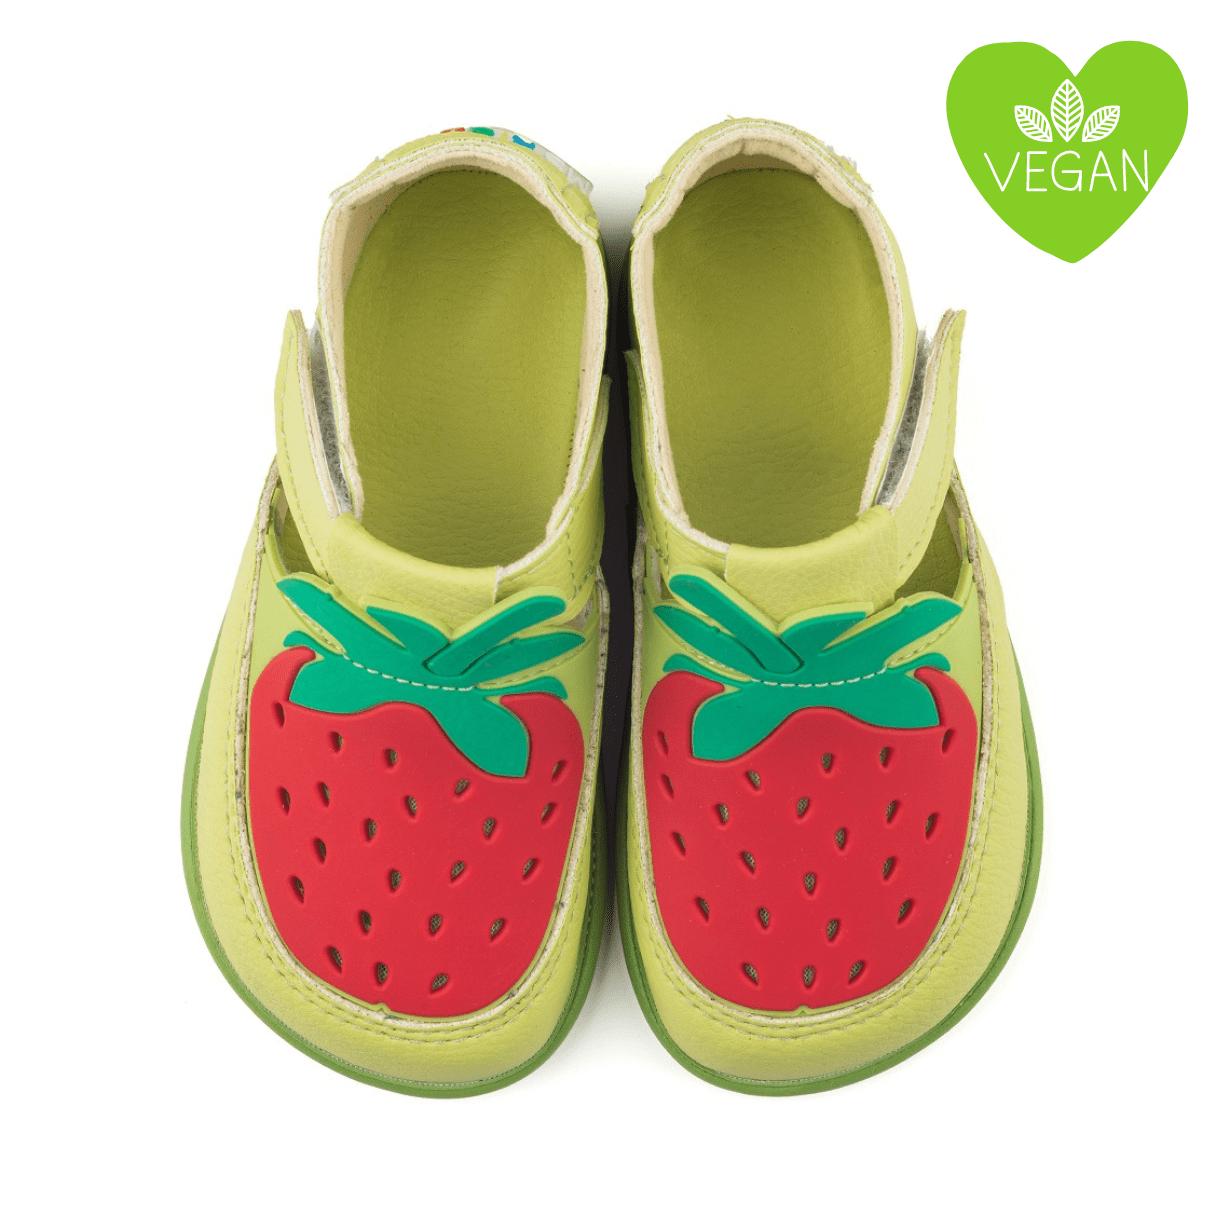 wiosenne buciki dziecięce Magcial Shoes GAGA  Vegan